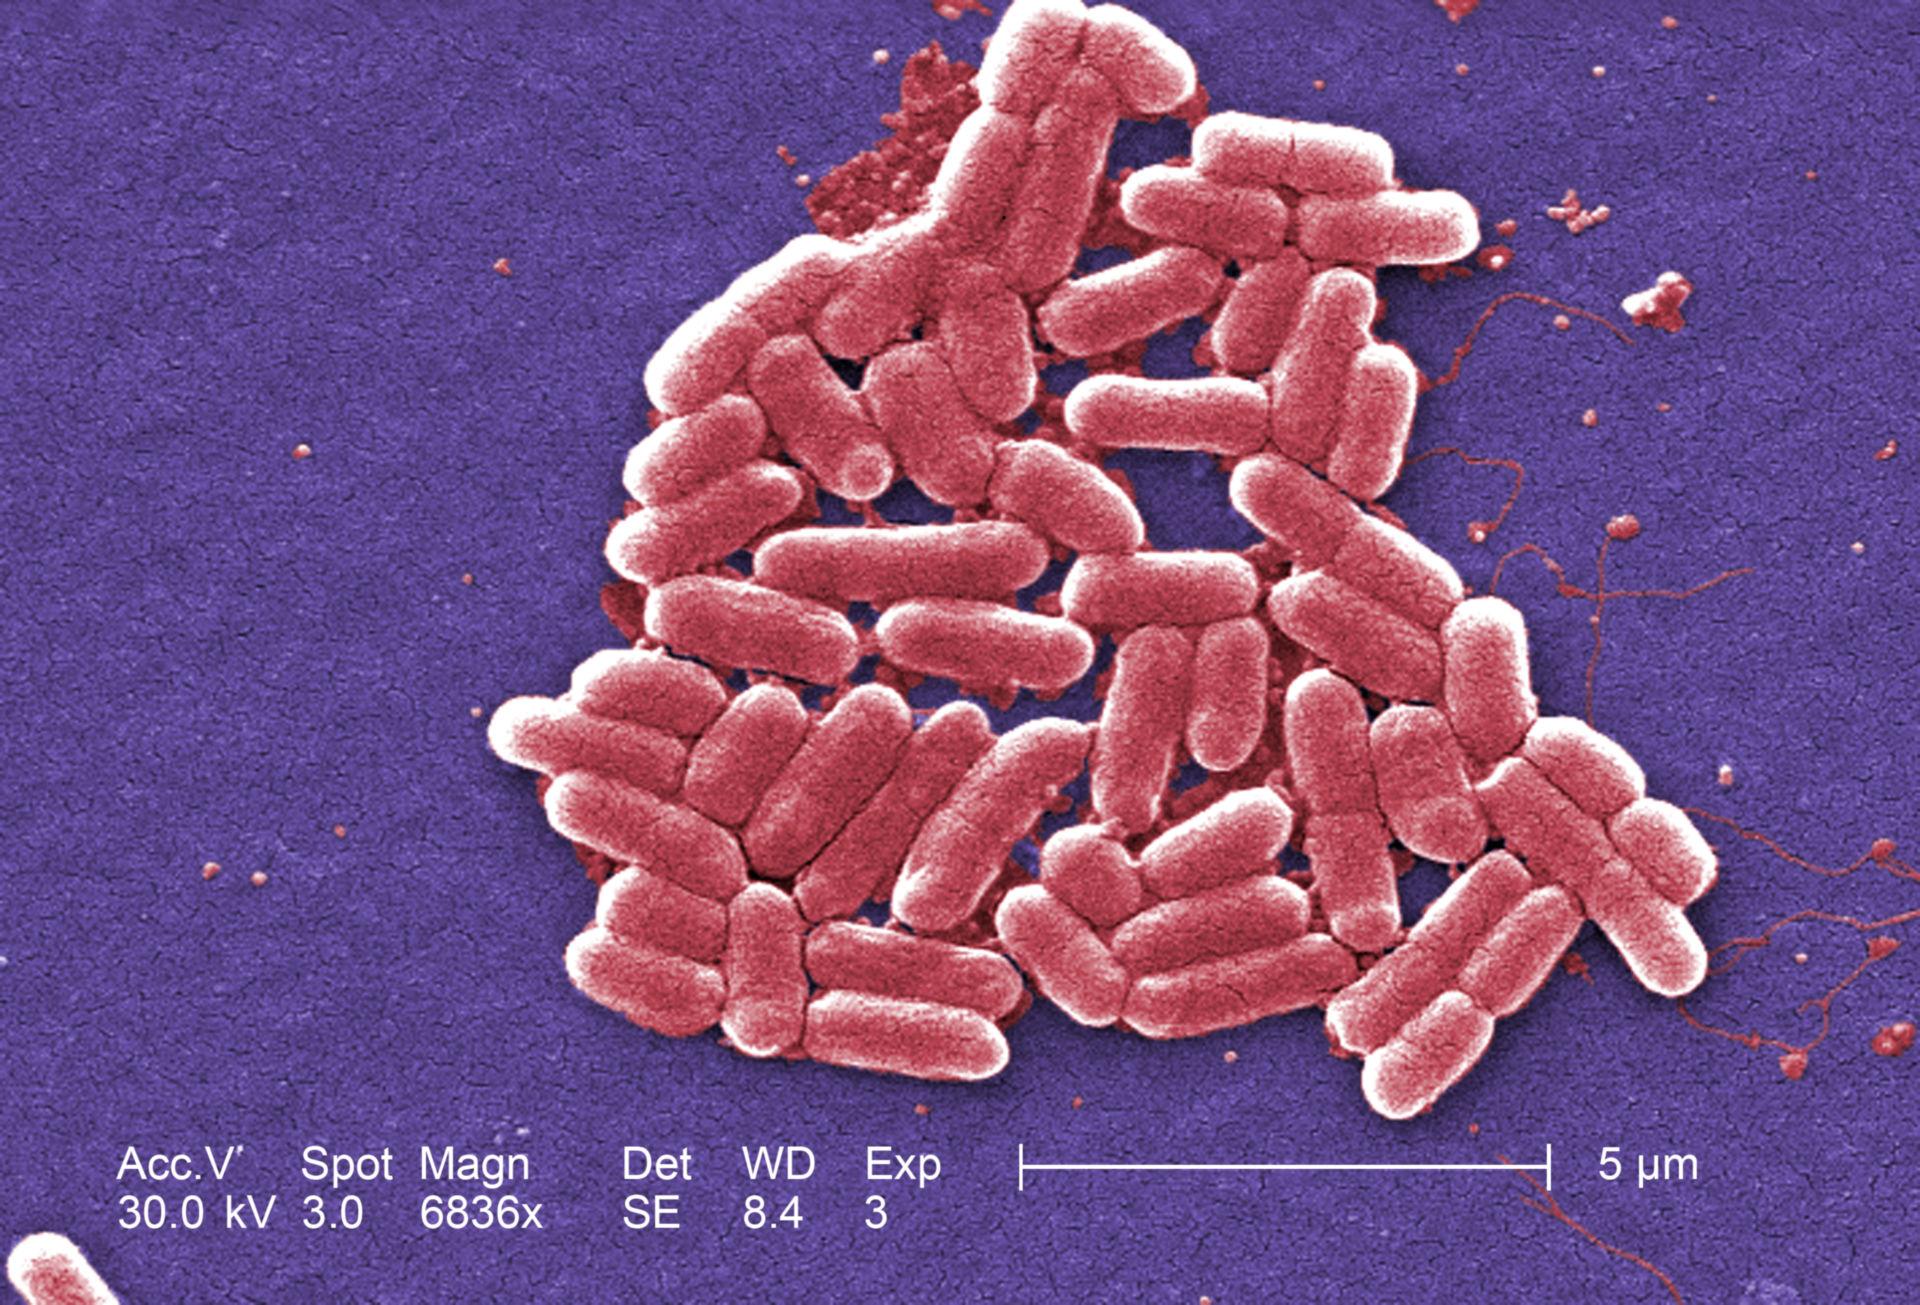 Gram-negative Escherichia coli O157: H7